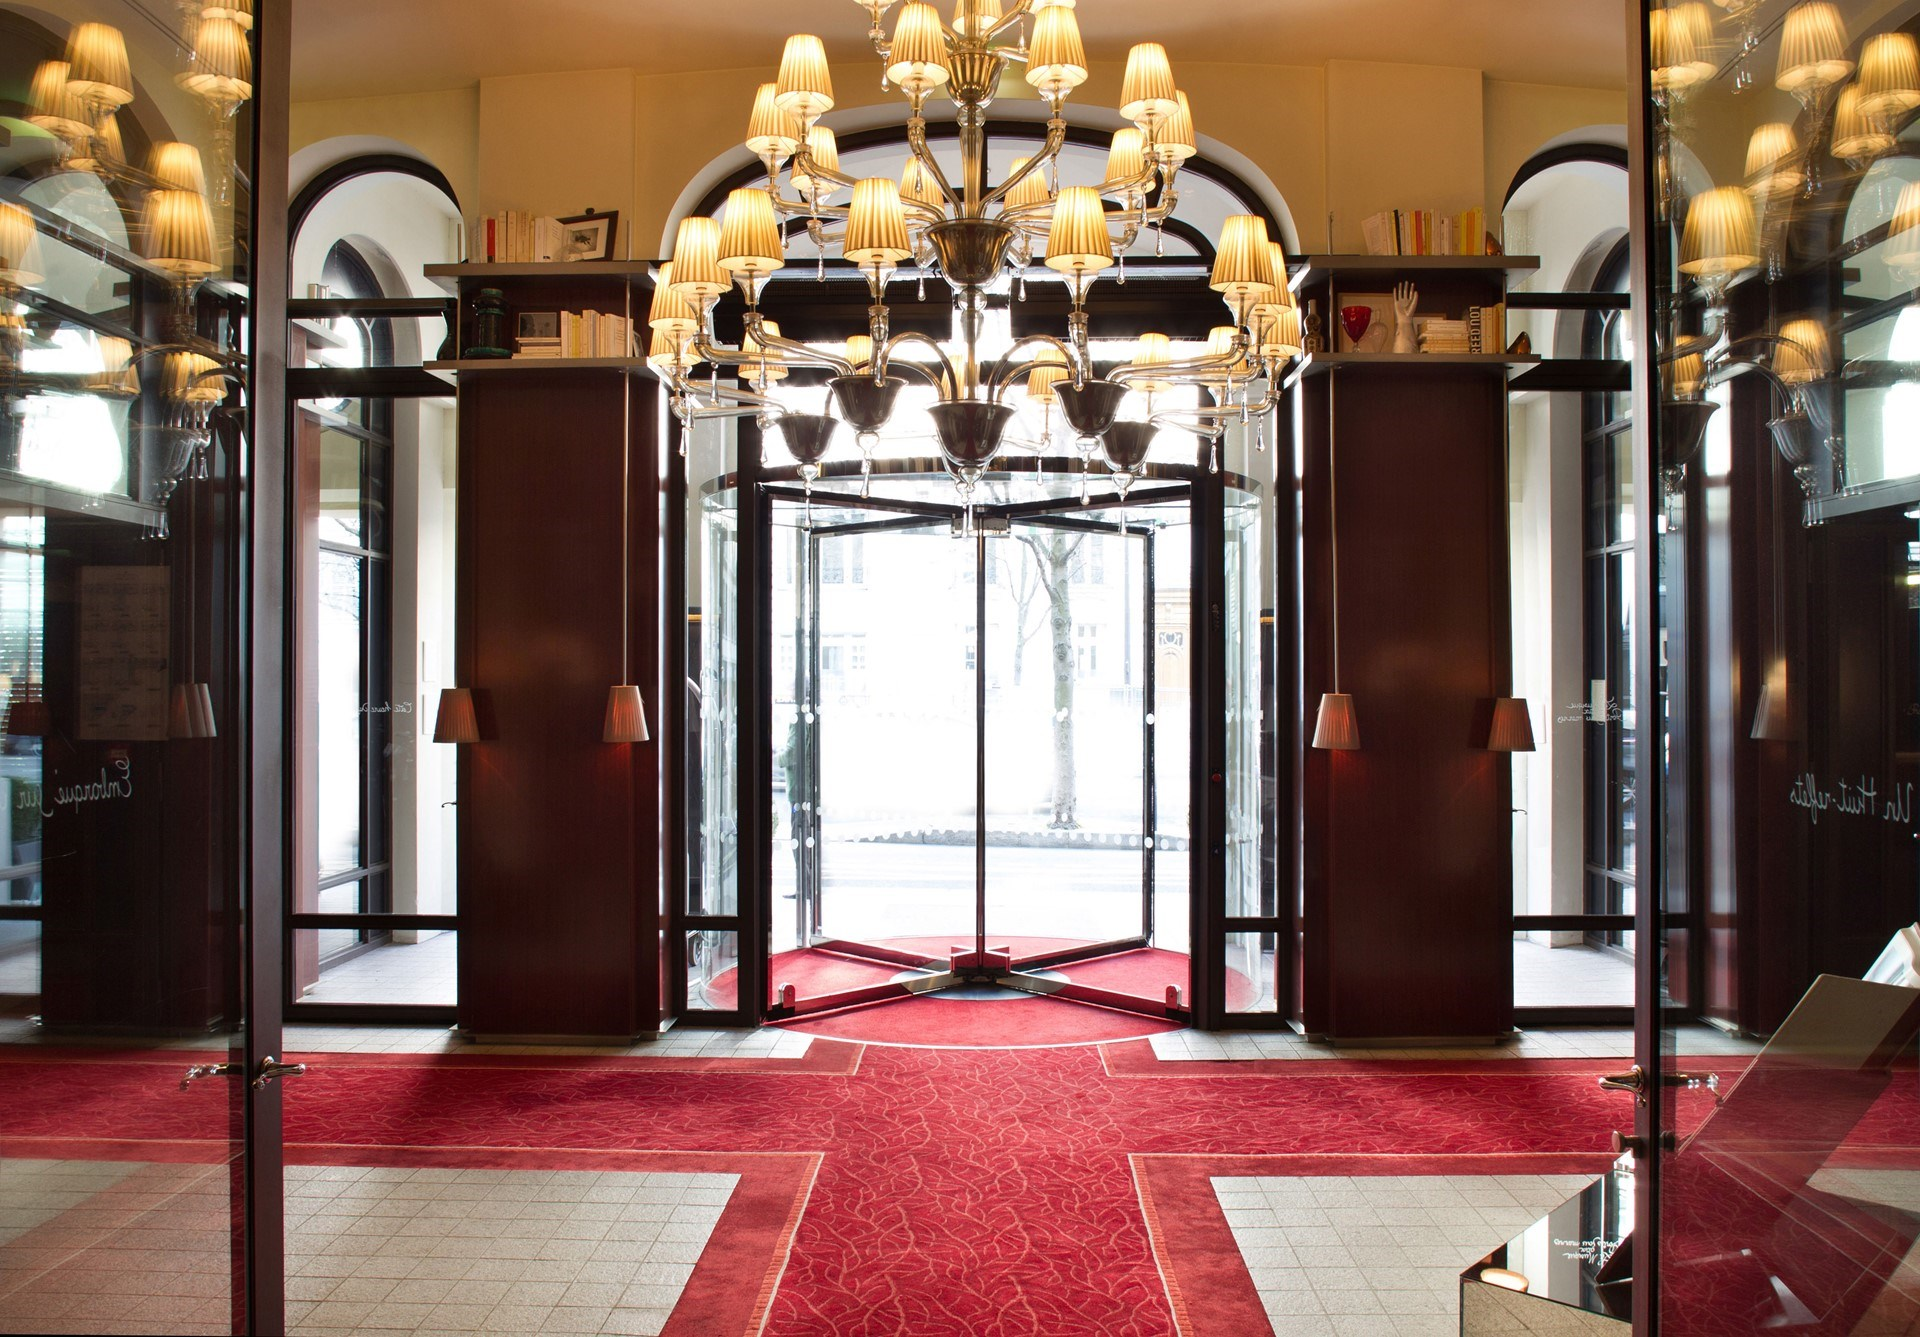 Le Royal Monceau Raffles - Luxury Holidays to Paris, Luxury Hotels ...